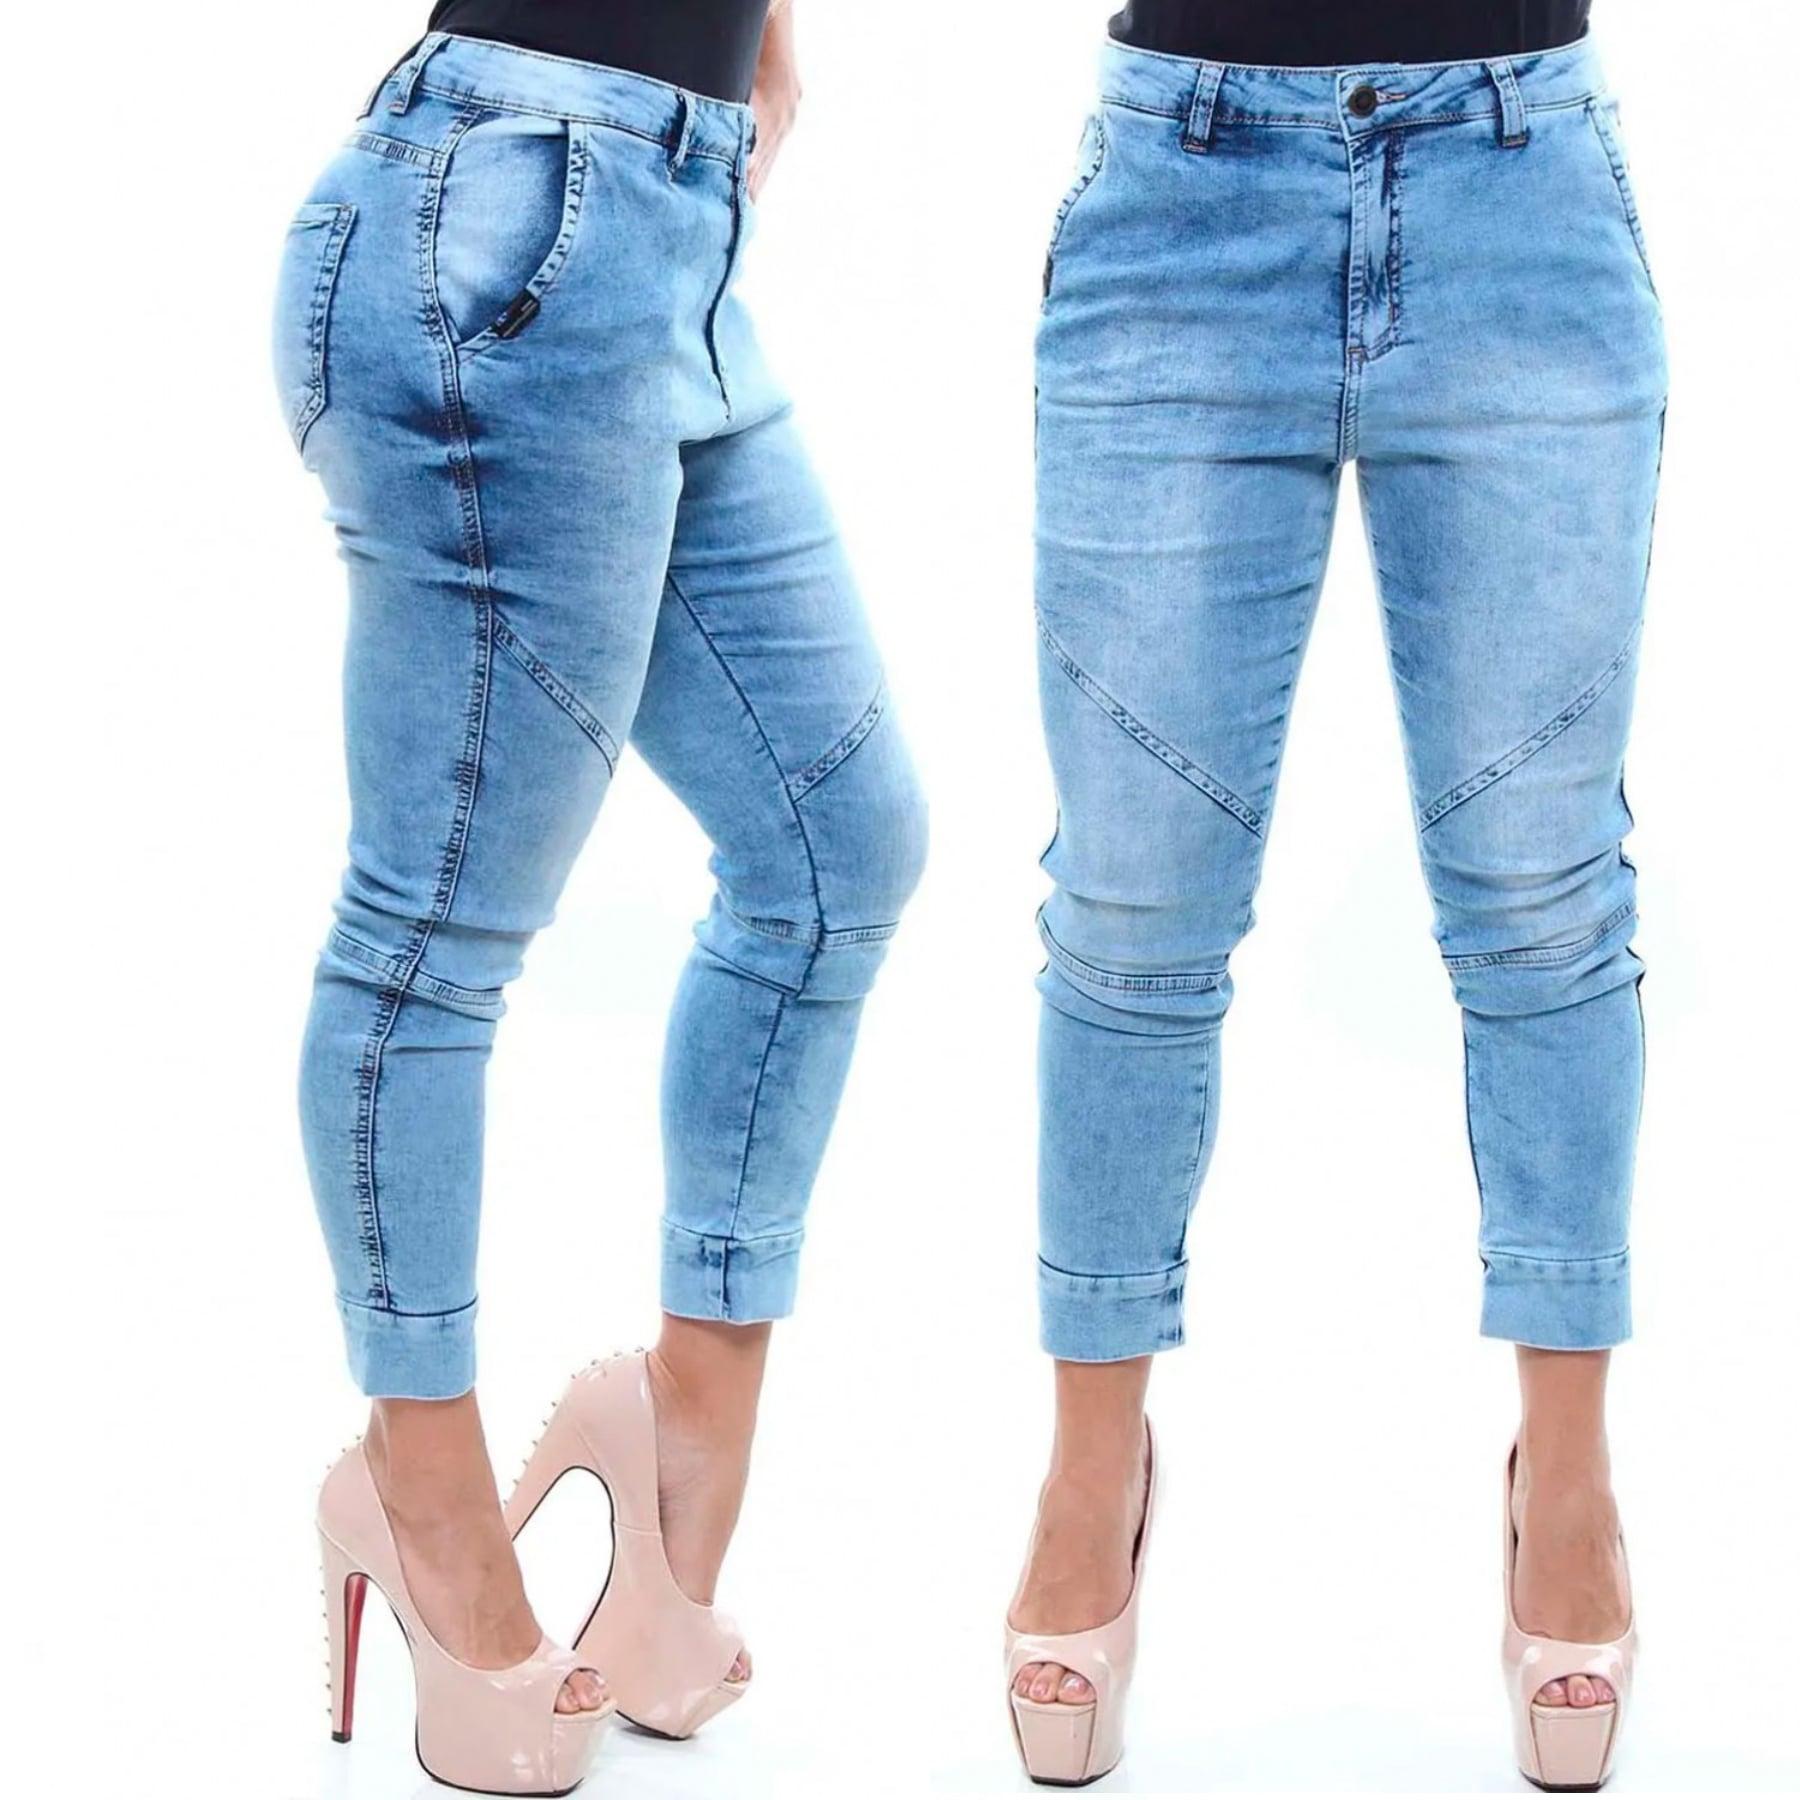 Calça Jeans Feminina Jogger Cor Jeans Claro Crocker